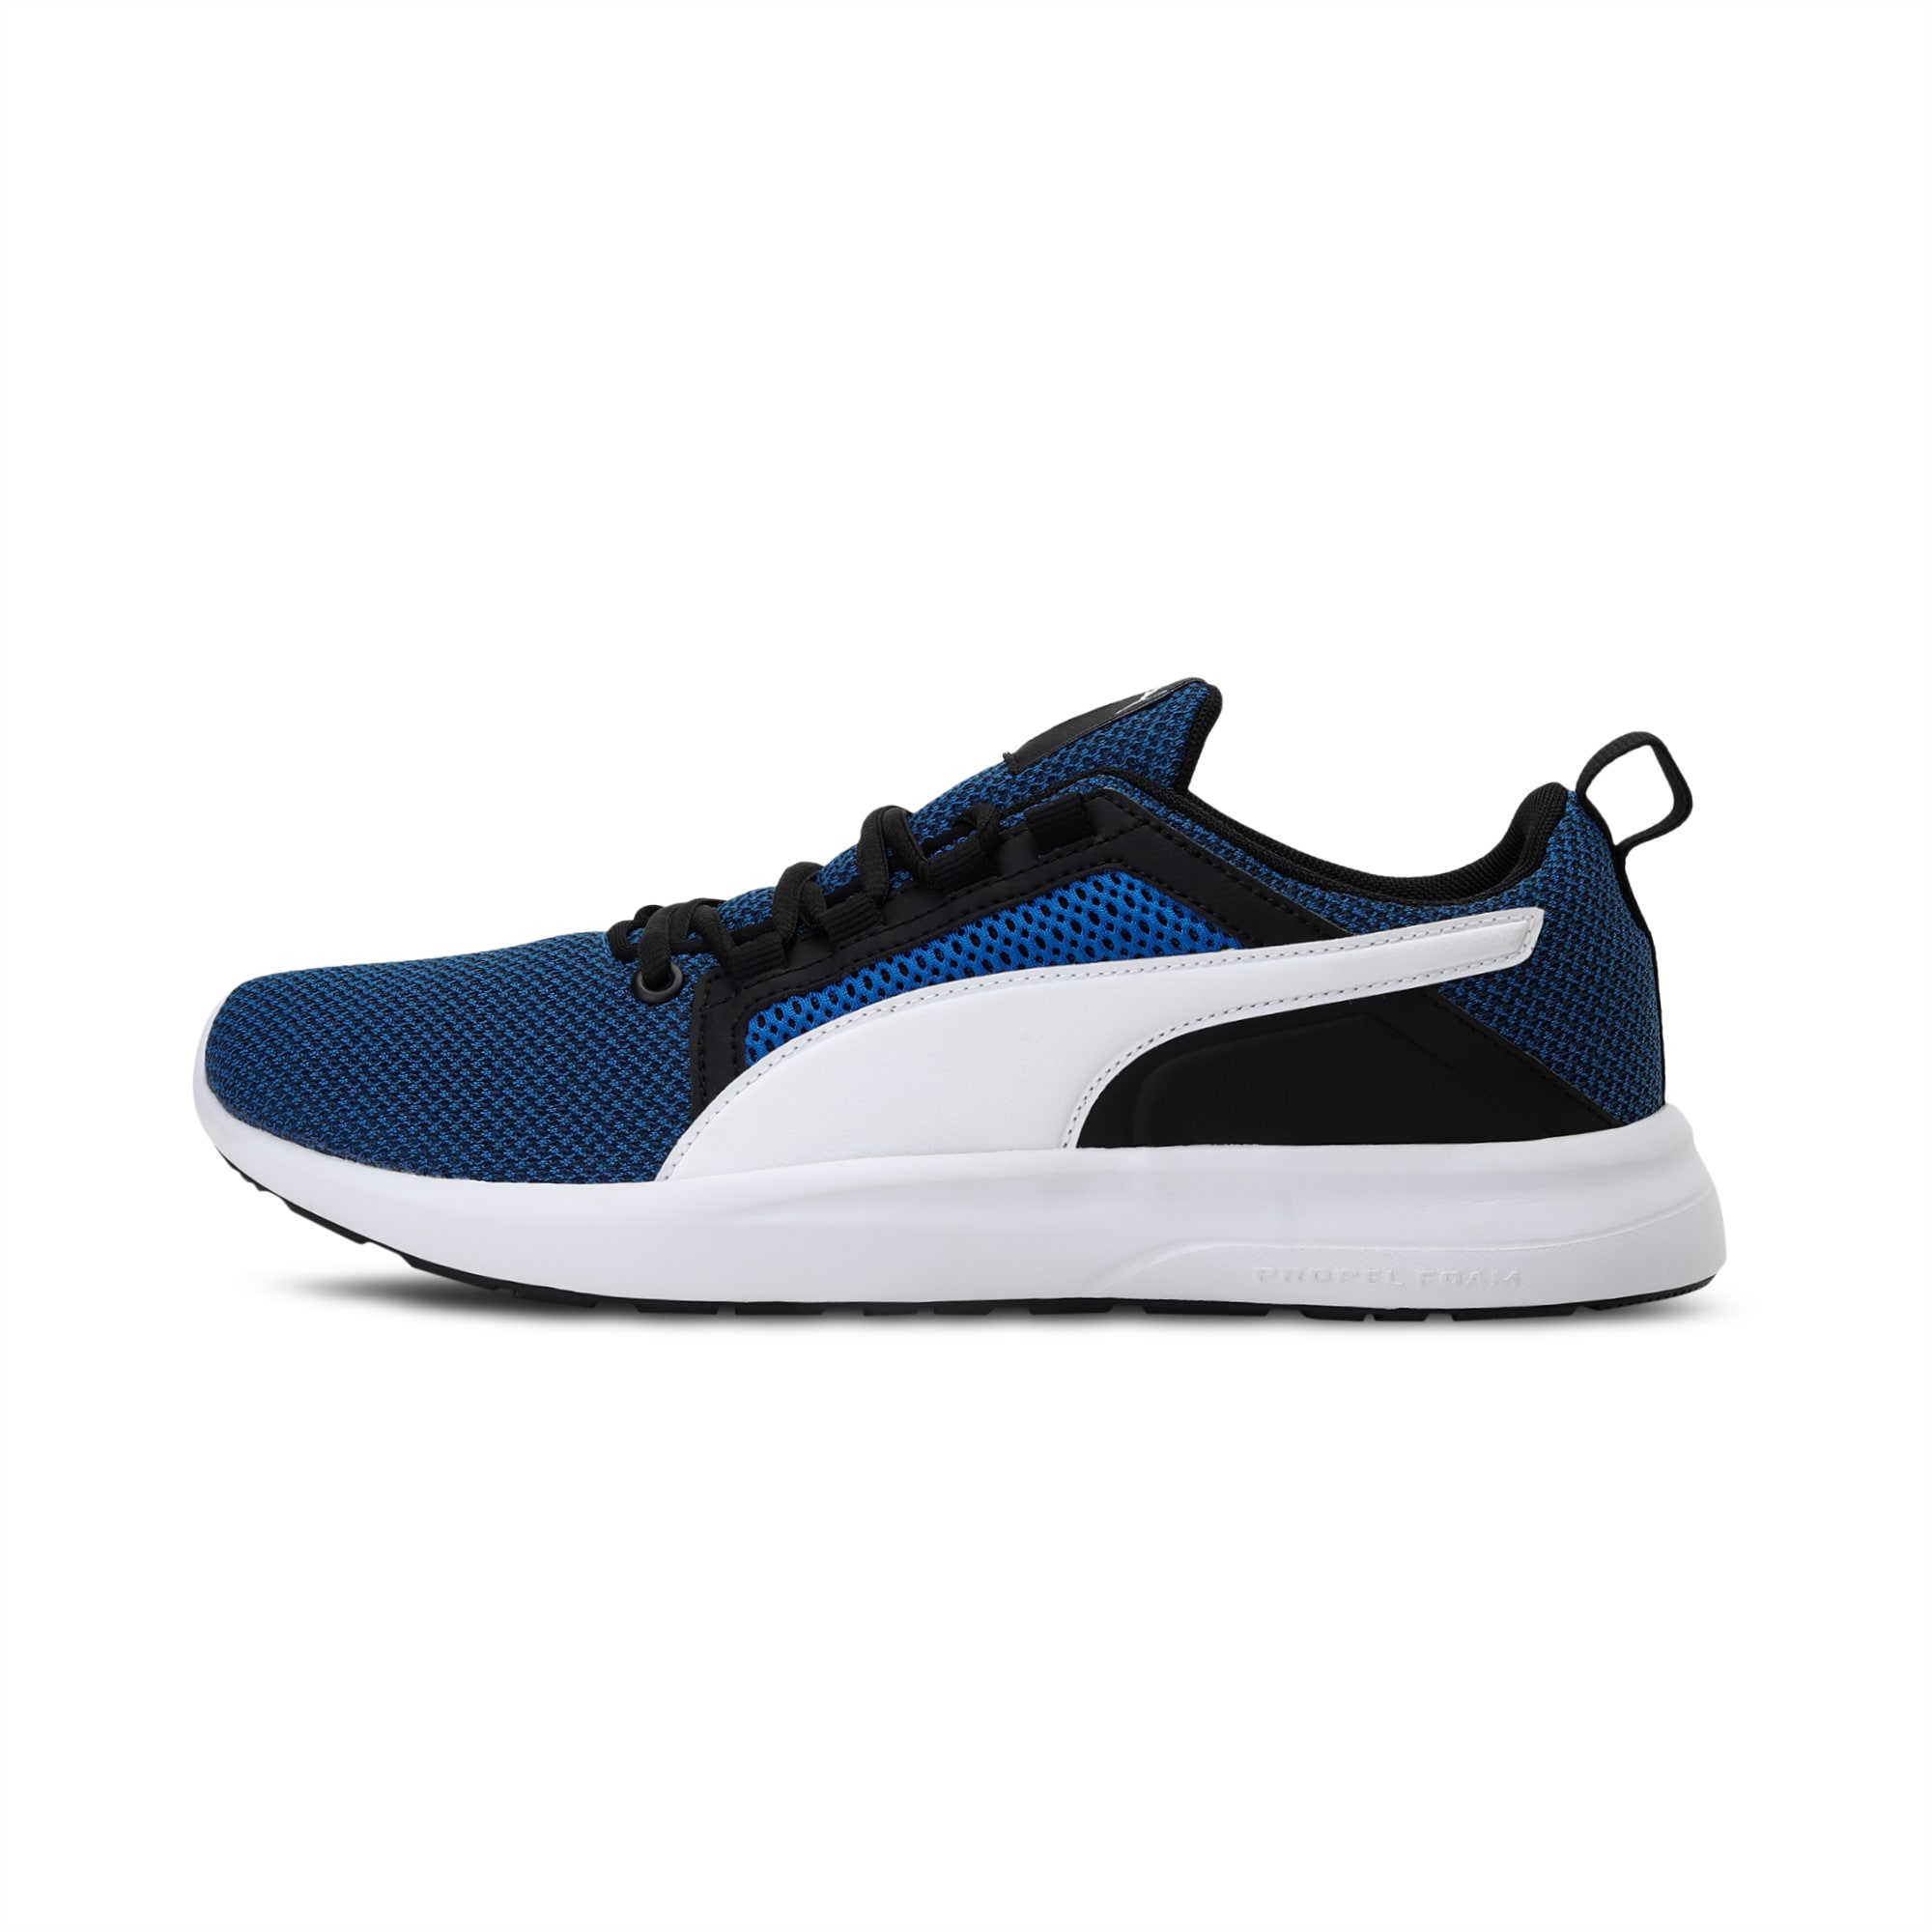 Styron IDP SoftFoam Sneakers